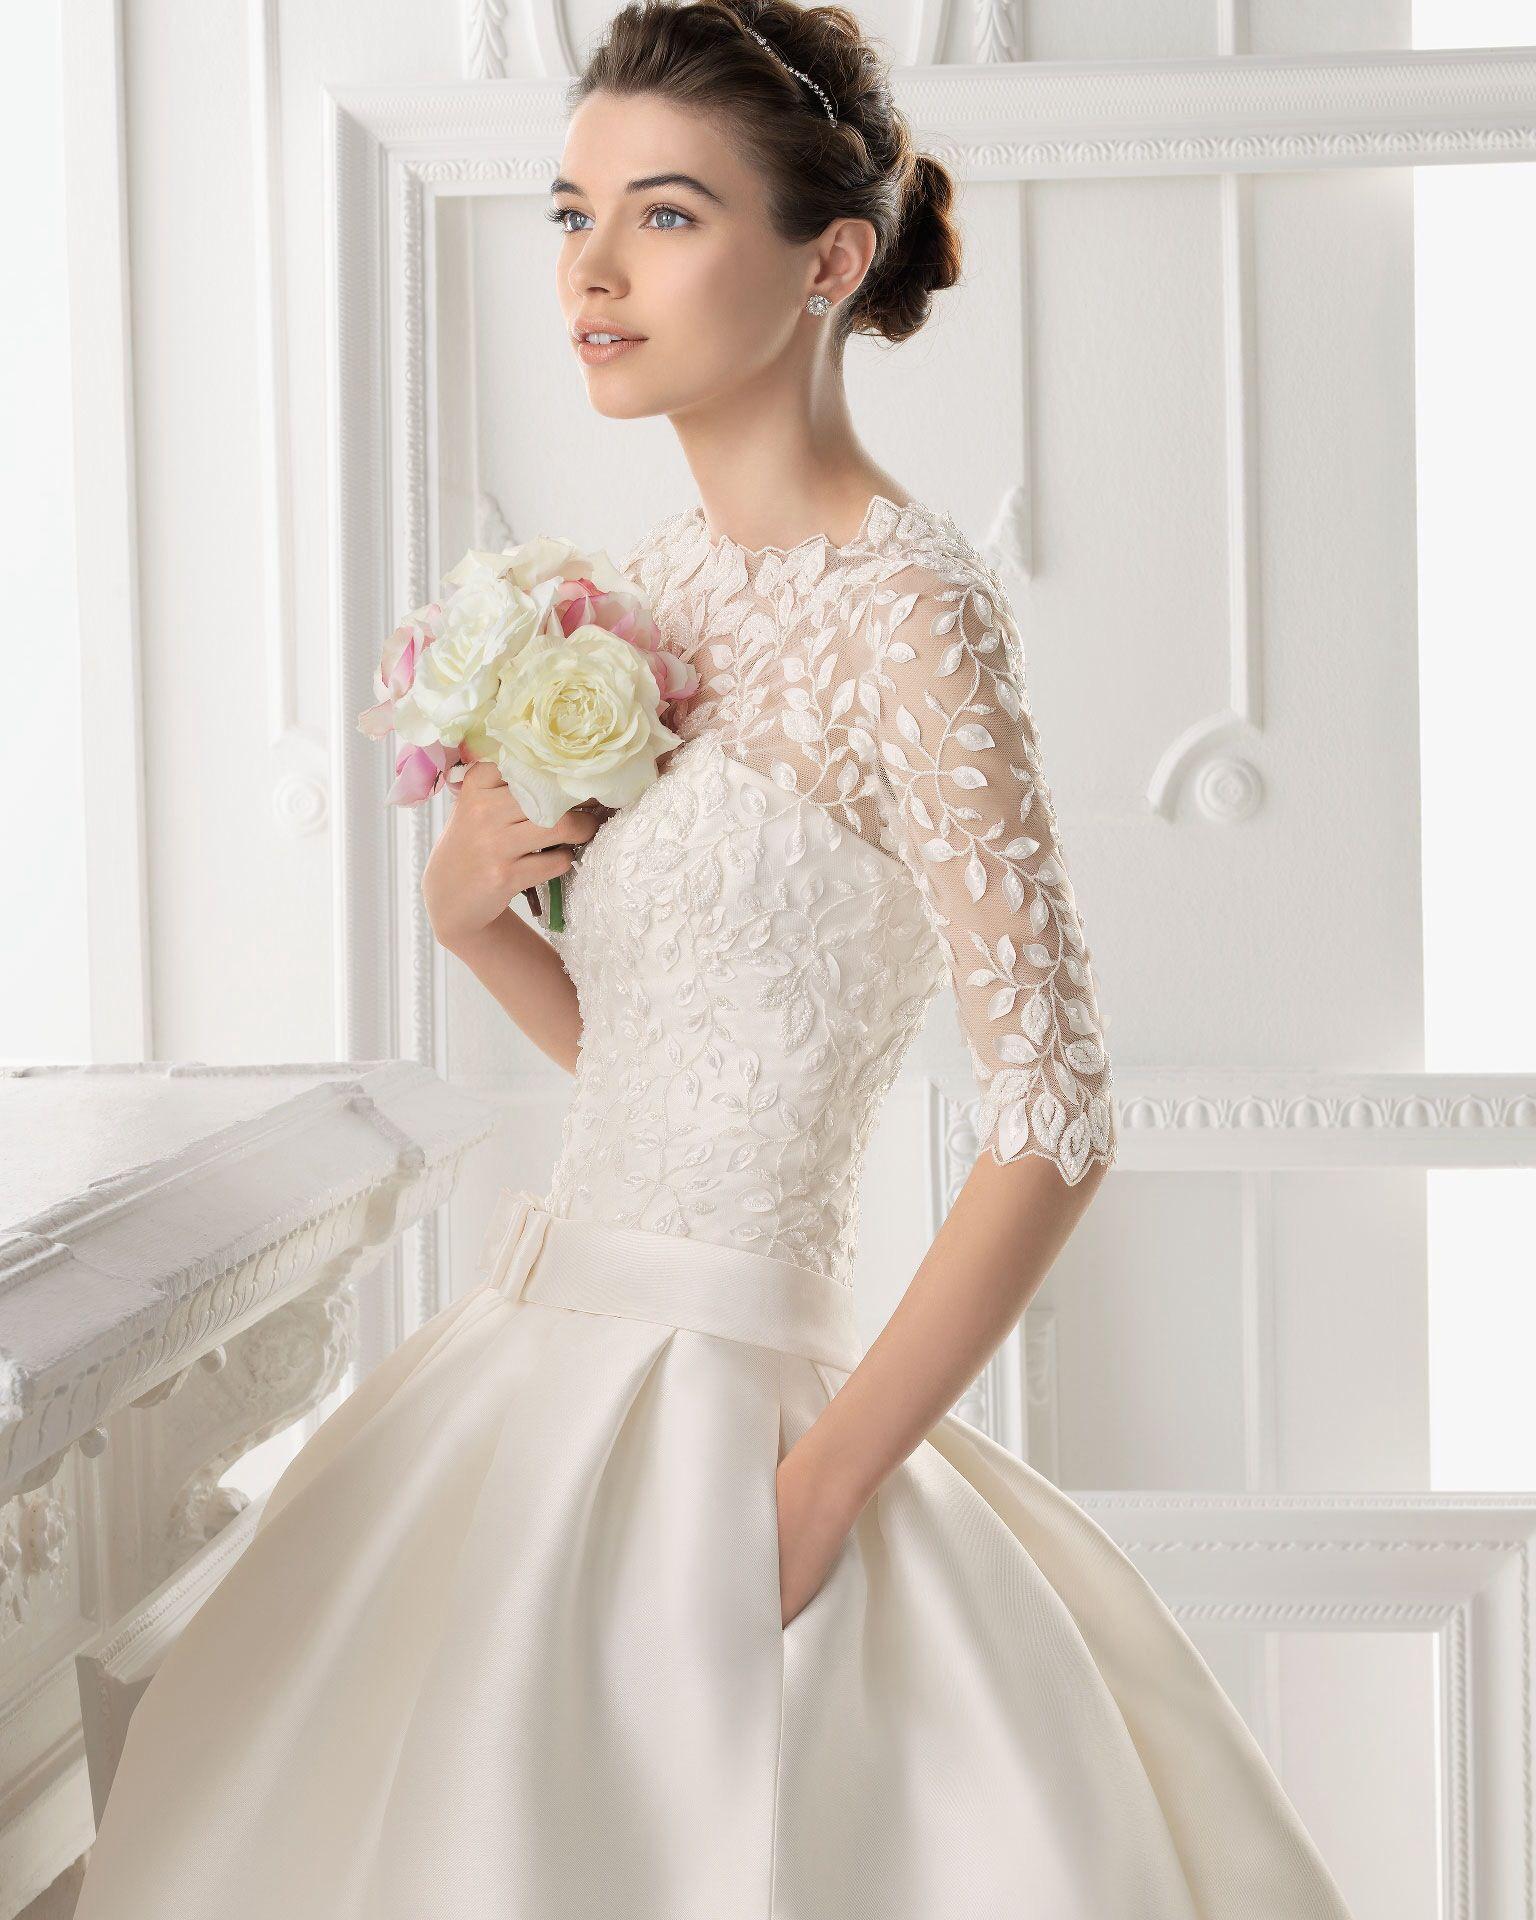 Explore Winter Wedding Dresses Weddings And More